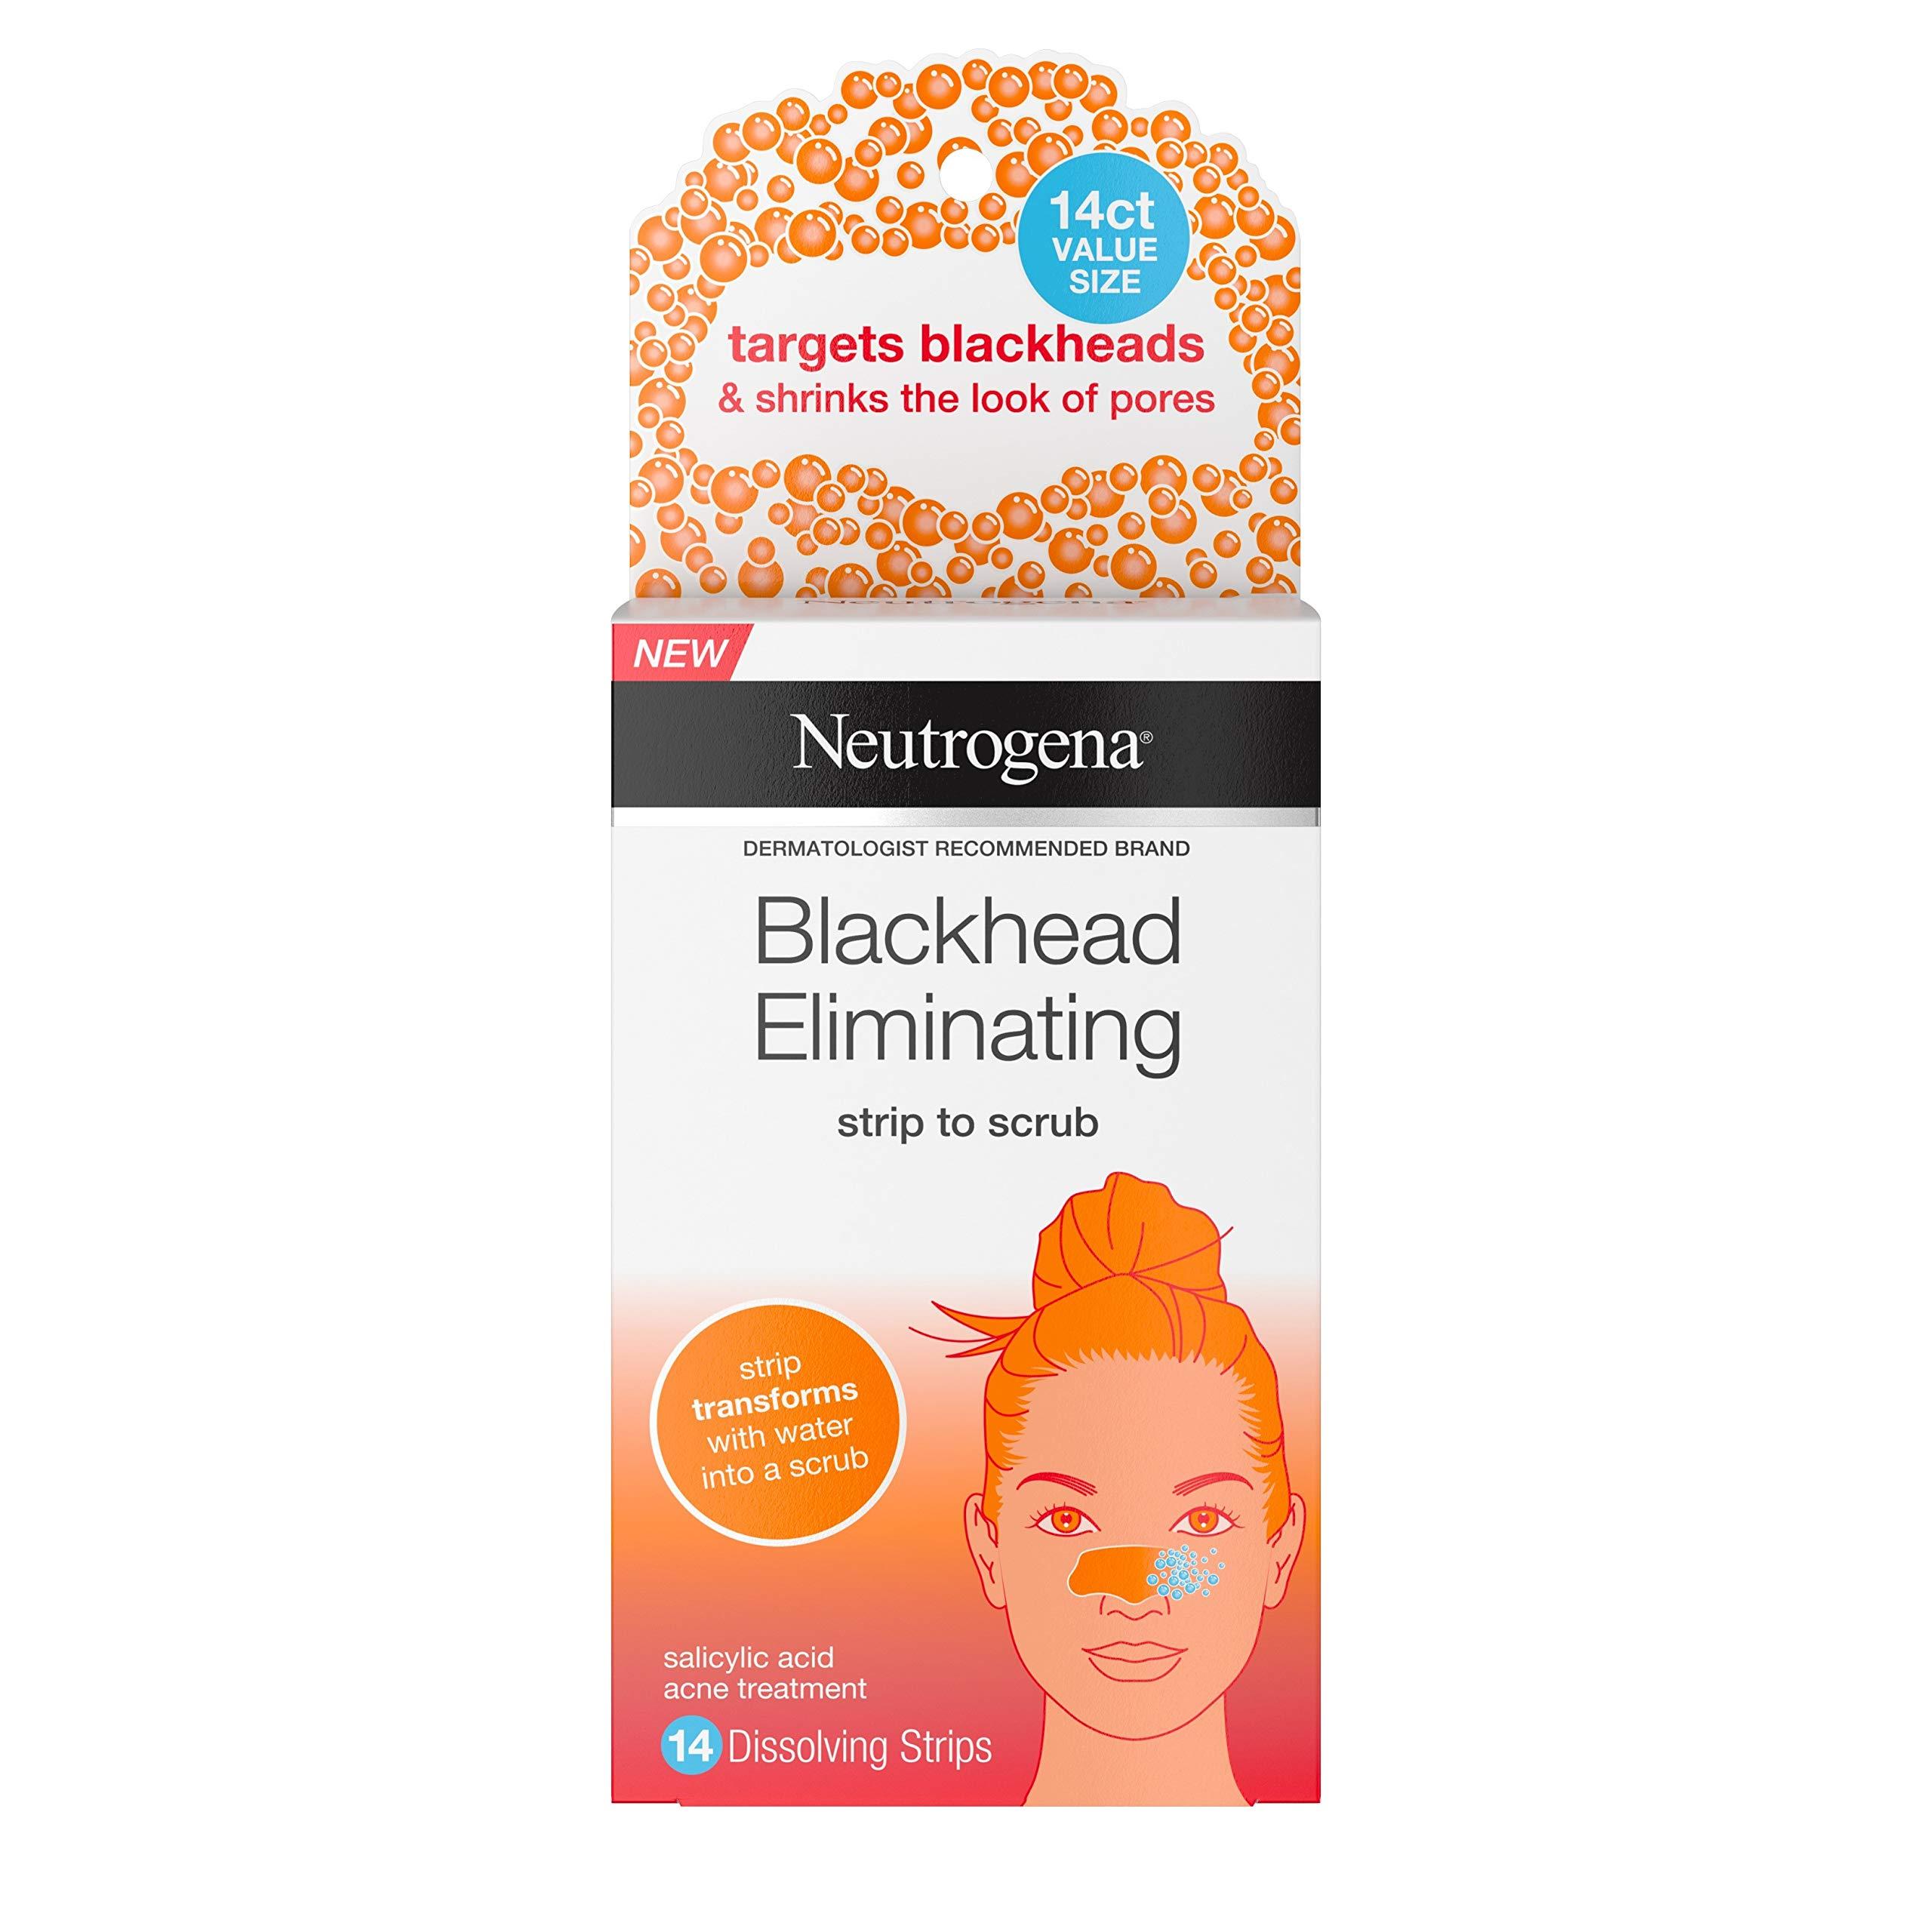 Neutrogena Blackhead Eliminating Pore Strip to Facial Scrub with Salicylic Acid Acne Treatment, Oil-Free & Non-Comedogenic, 14 ct. by Neutrogena